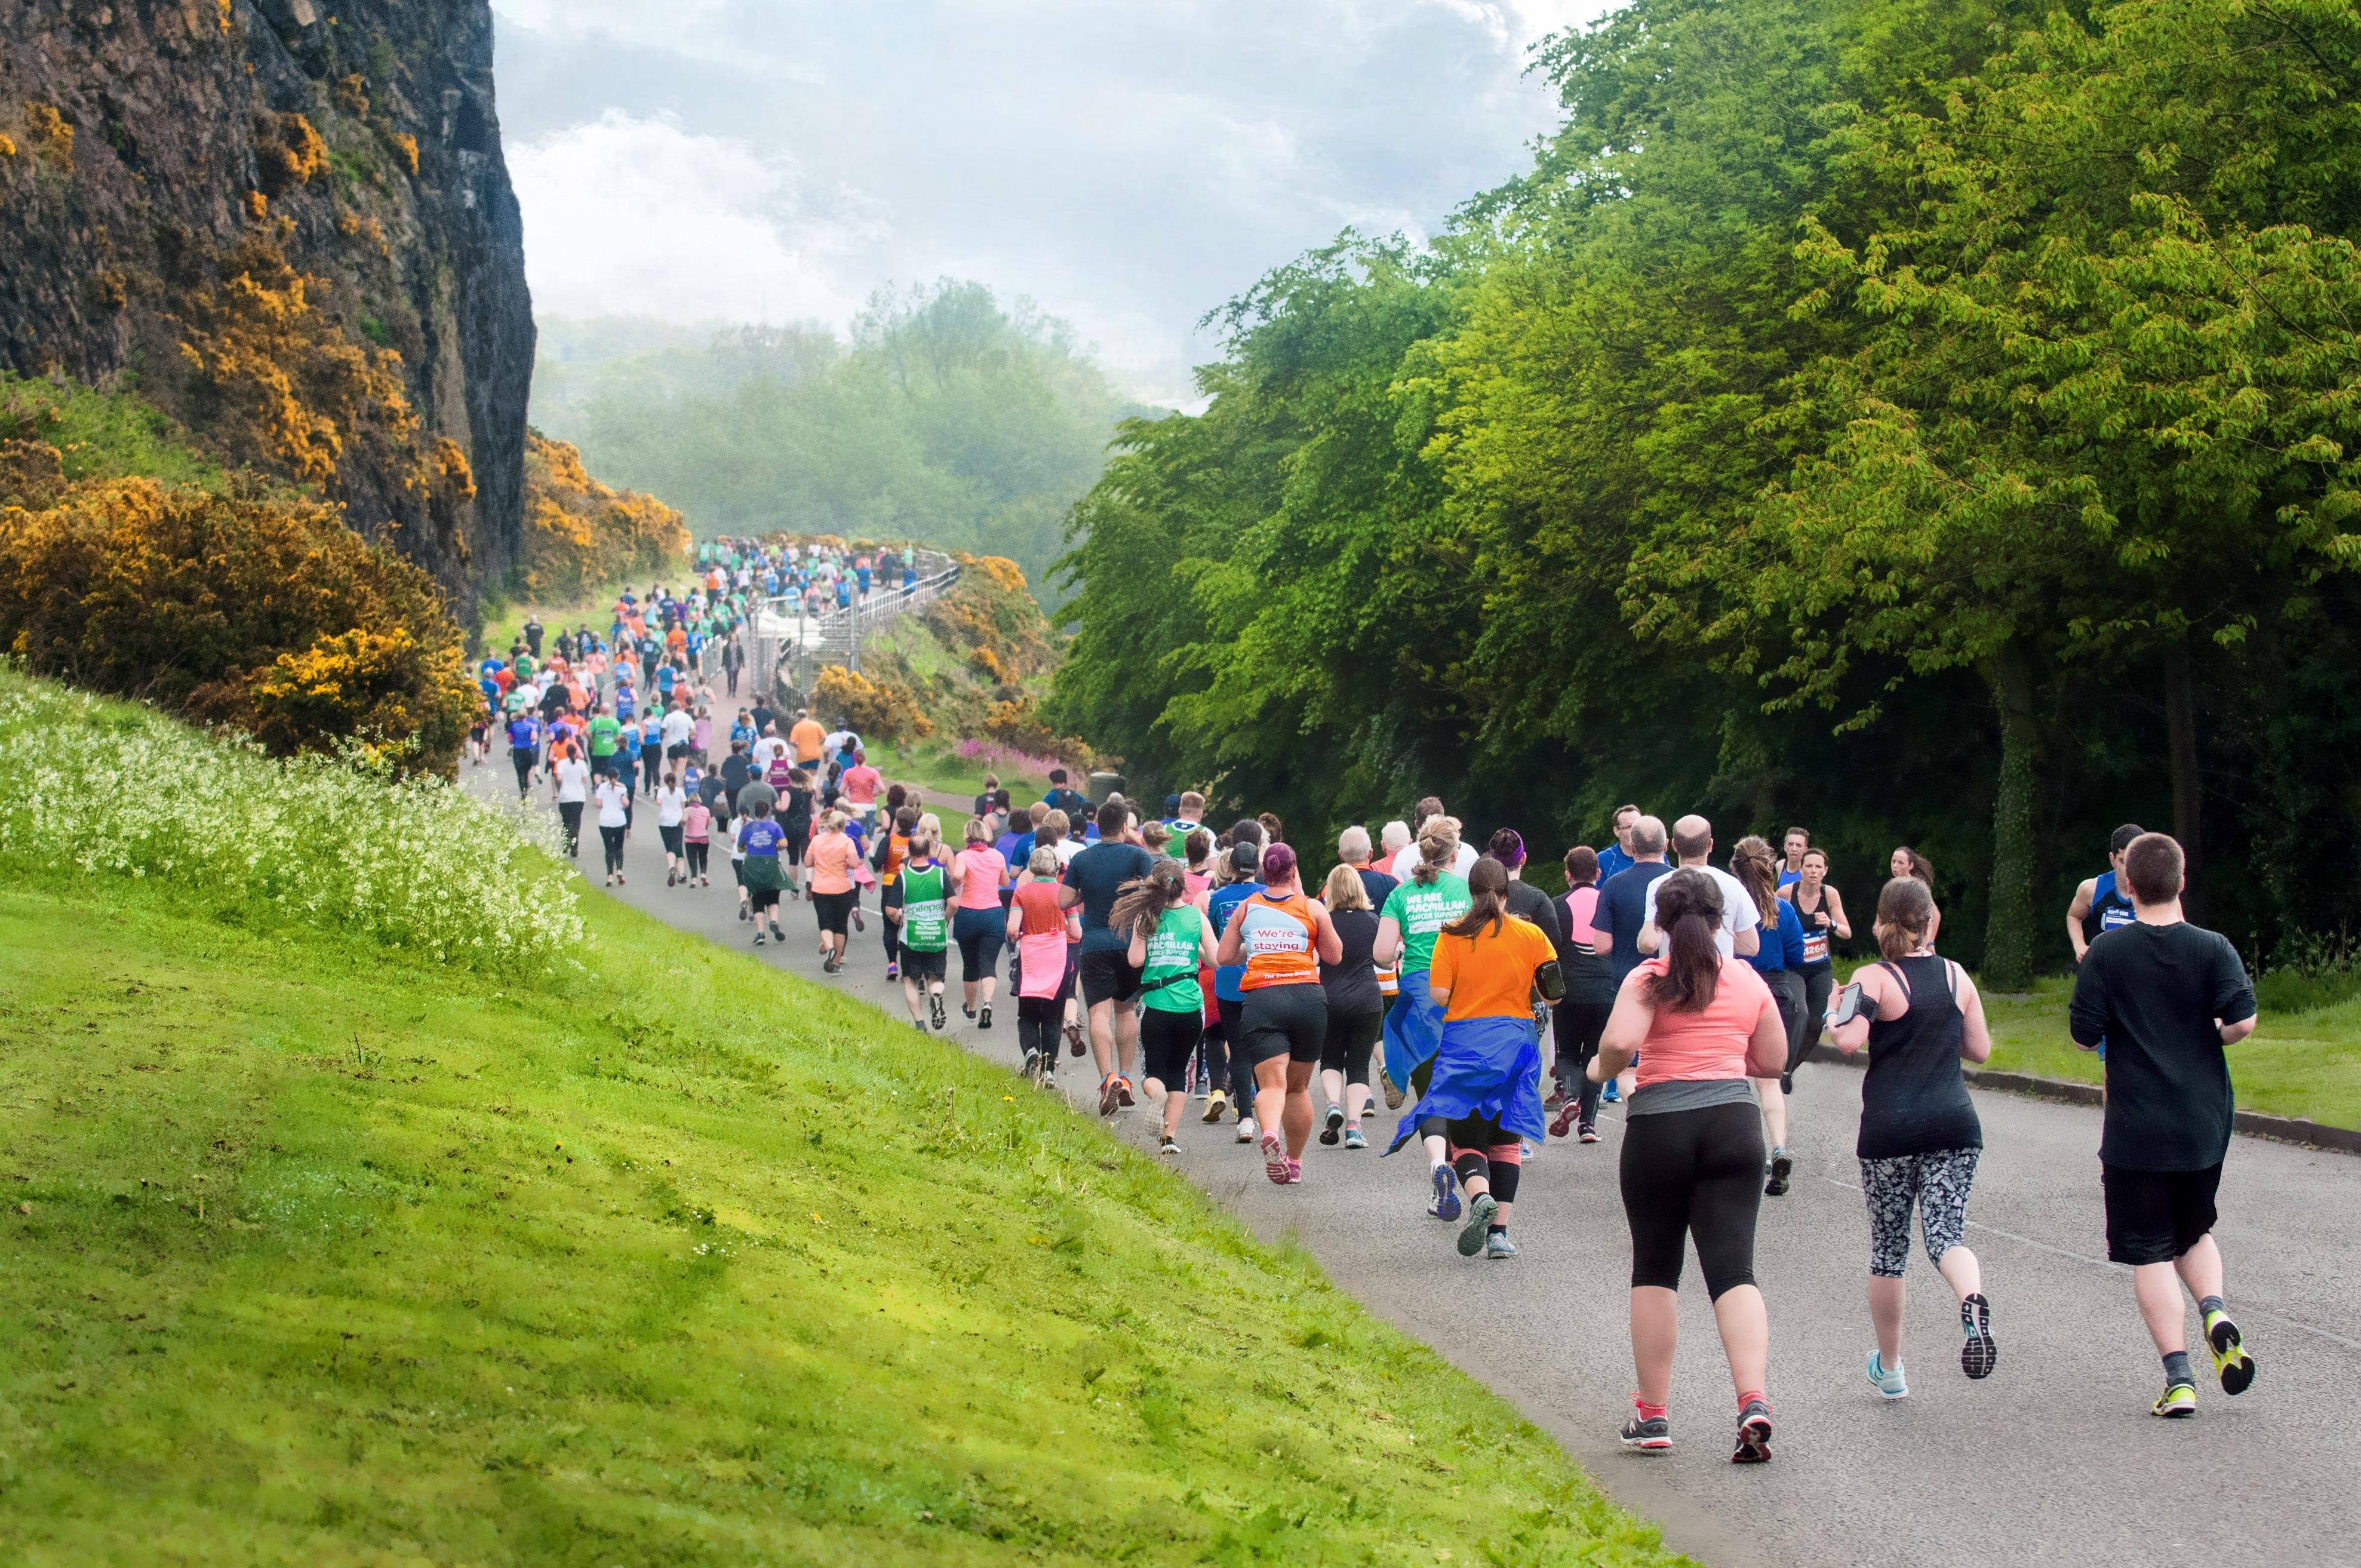 Runners in the Edinburgh Marathon at Arthur Seat